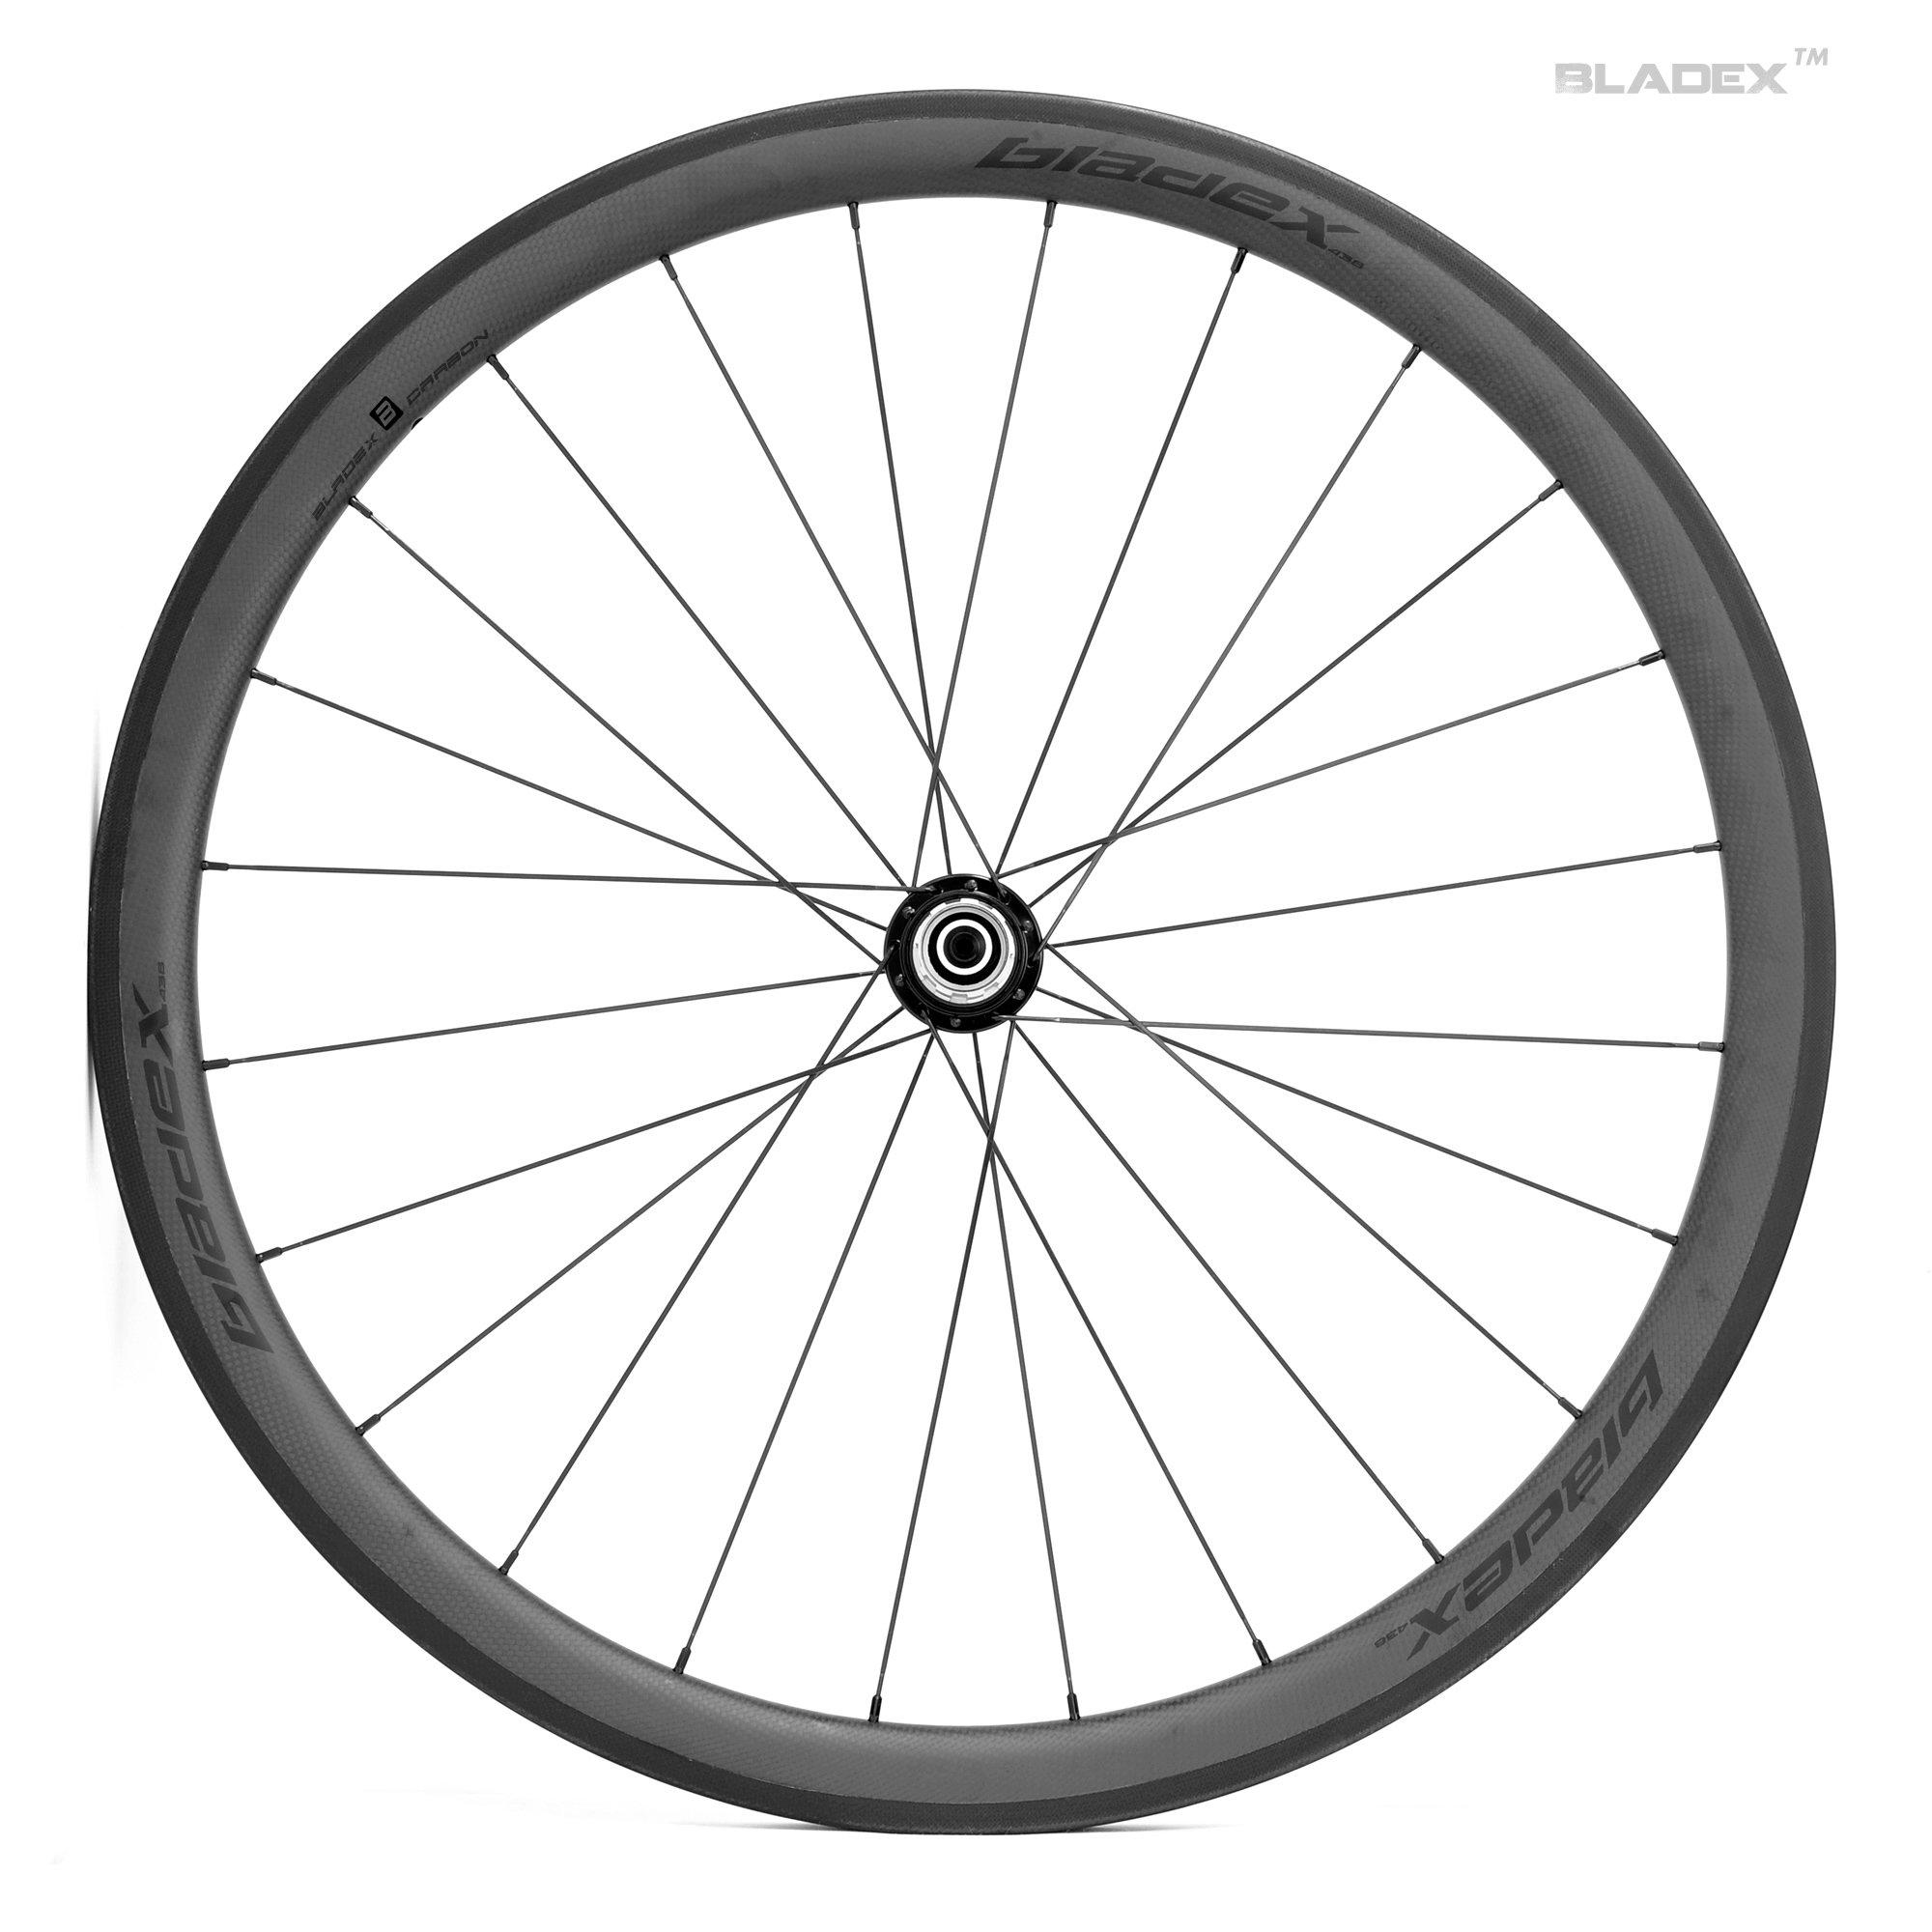 rear hub embly with Ponents Of A Rear Bike Wheel on 7 Segment Display Circuit Board Diagram as well Bike Rear Wheel Hub Bearing Embly also Bagger Bikes additionally Hydraulic Hub Motor together with Bmw Wheel Hub Assembly Diagram.